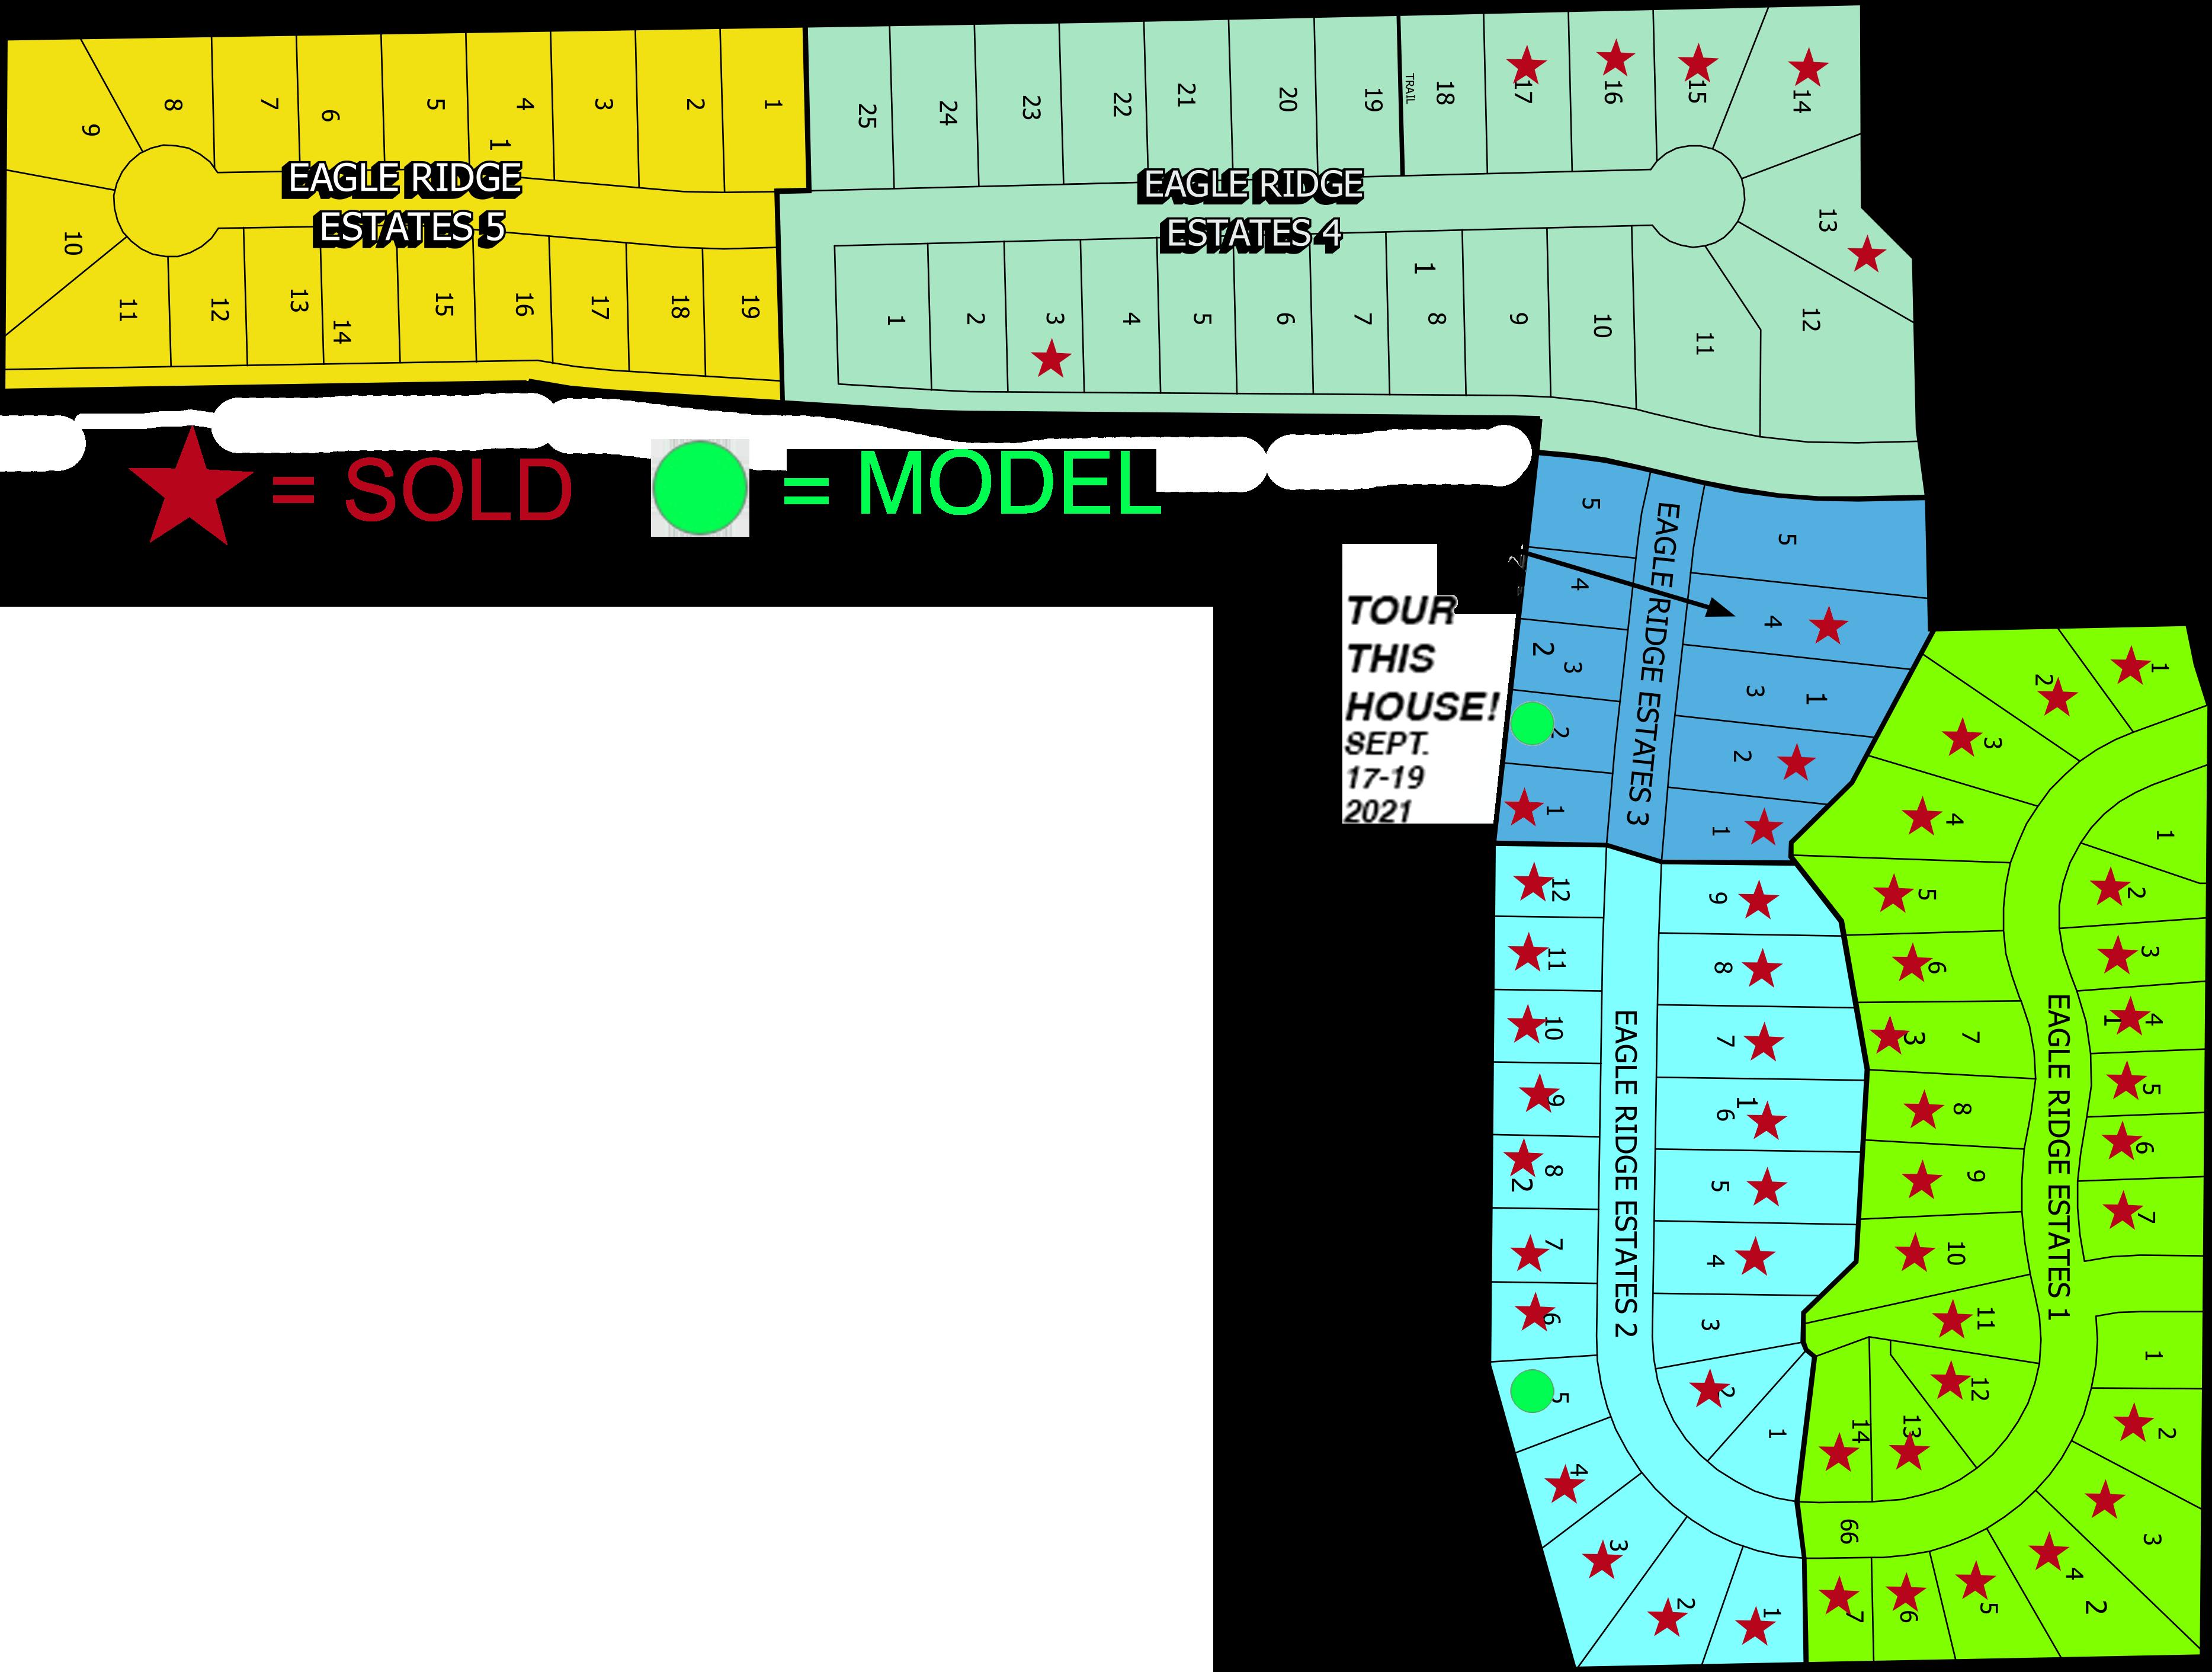 Eagle Ridge Estates Development by Wollak Construction